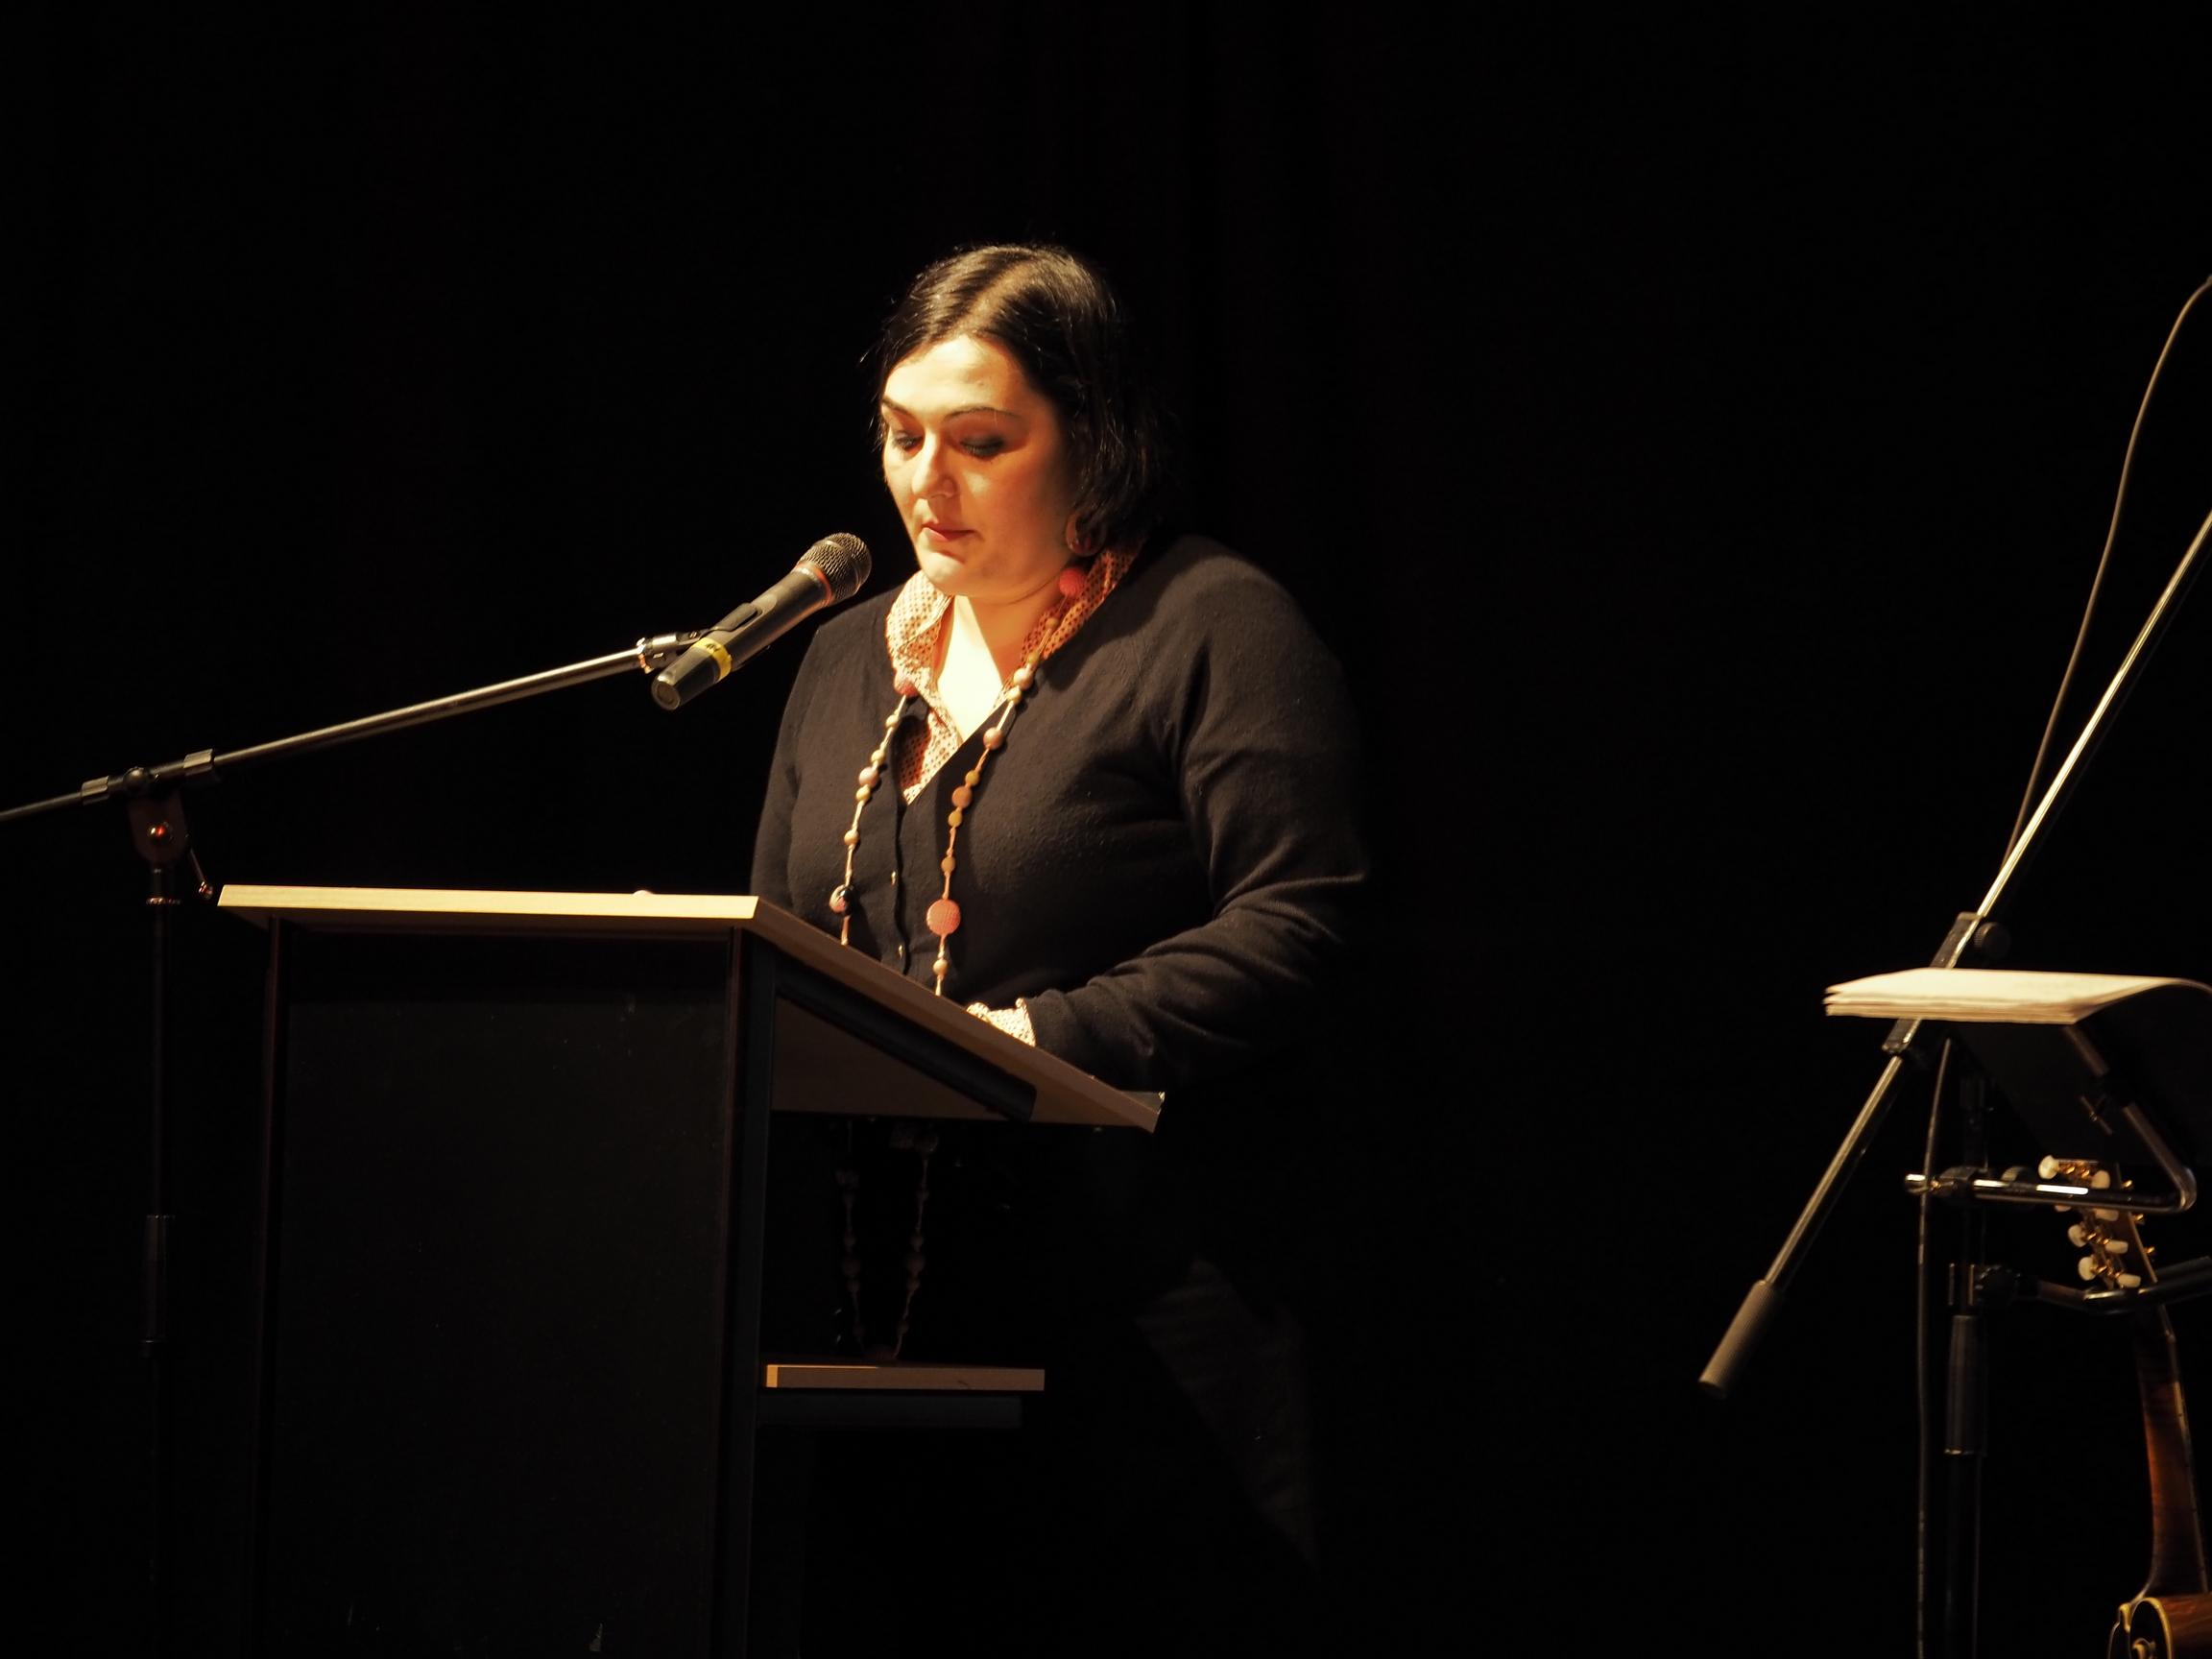 Fabiana Saviano